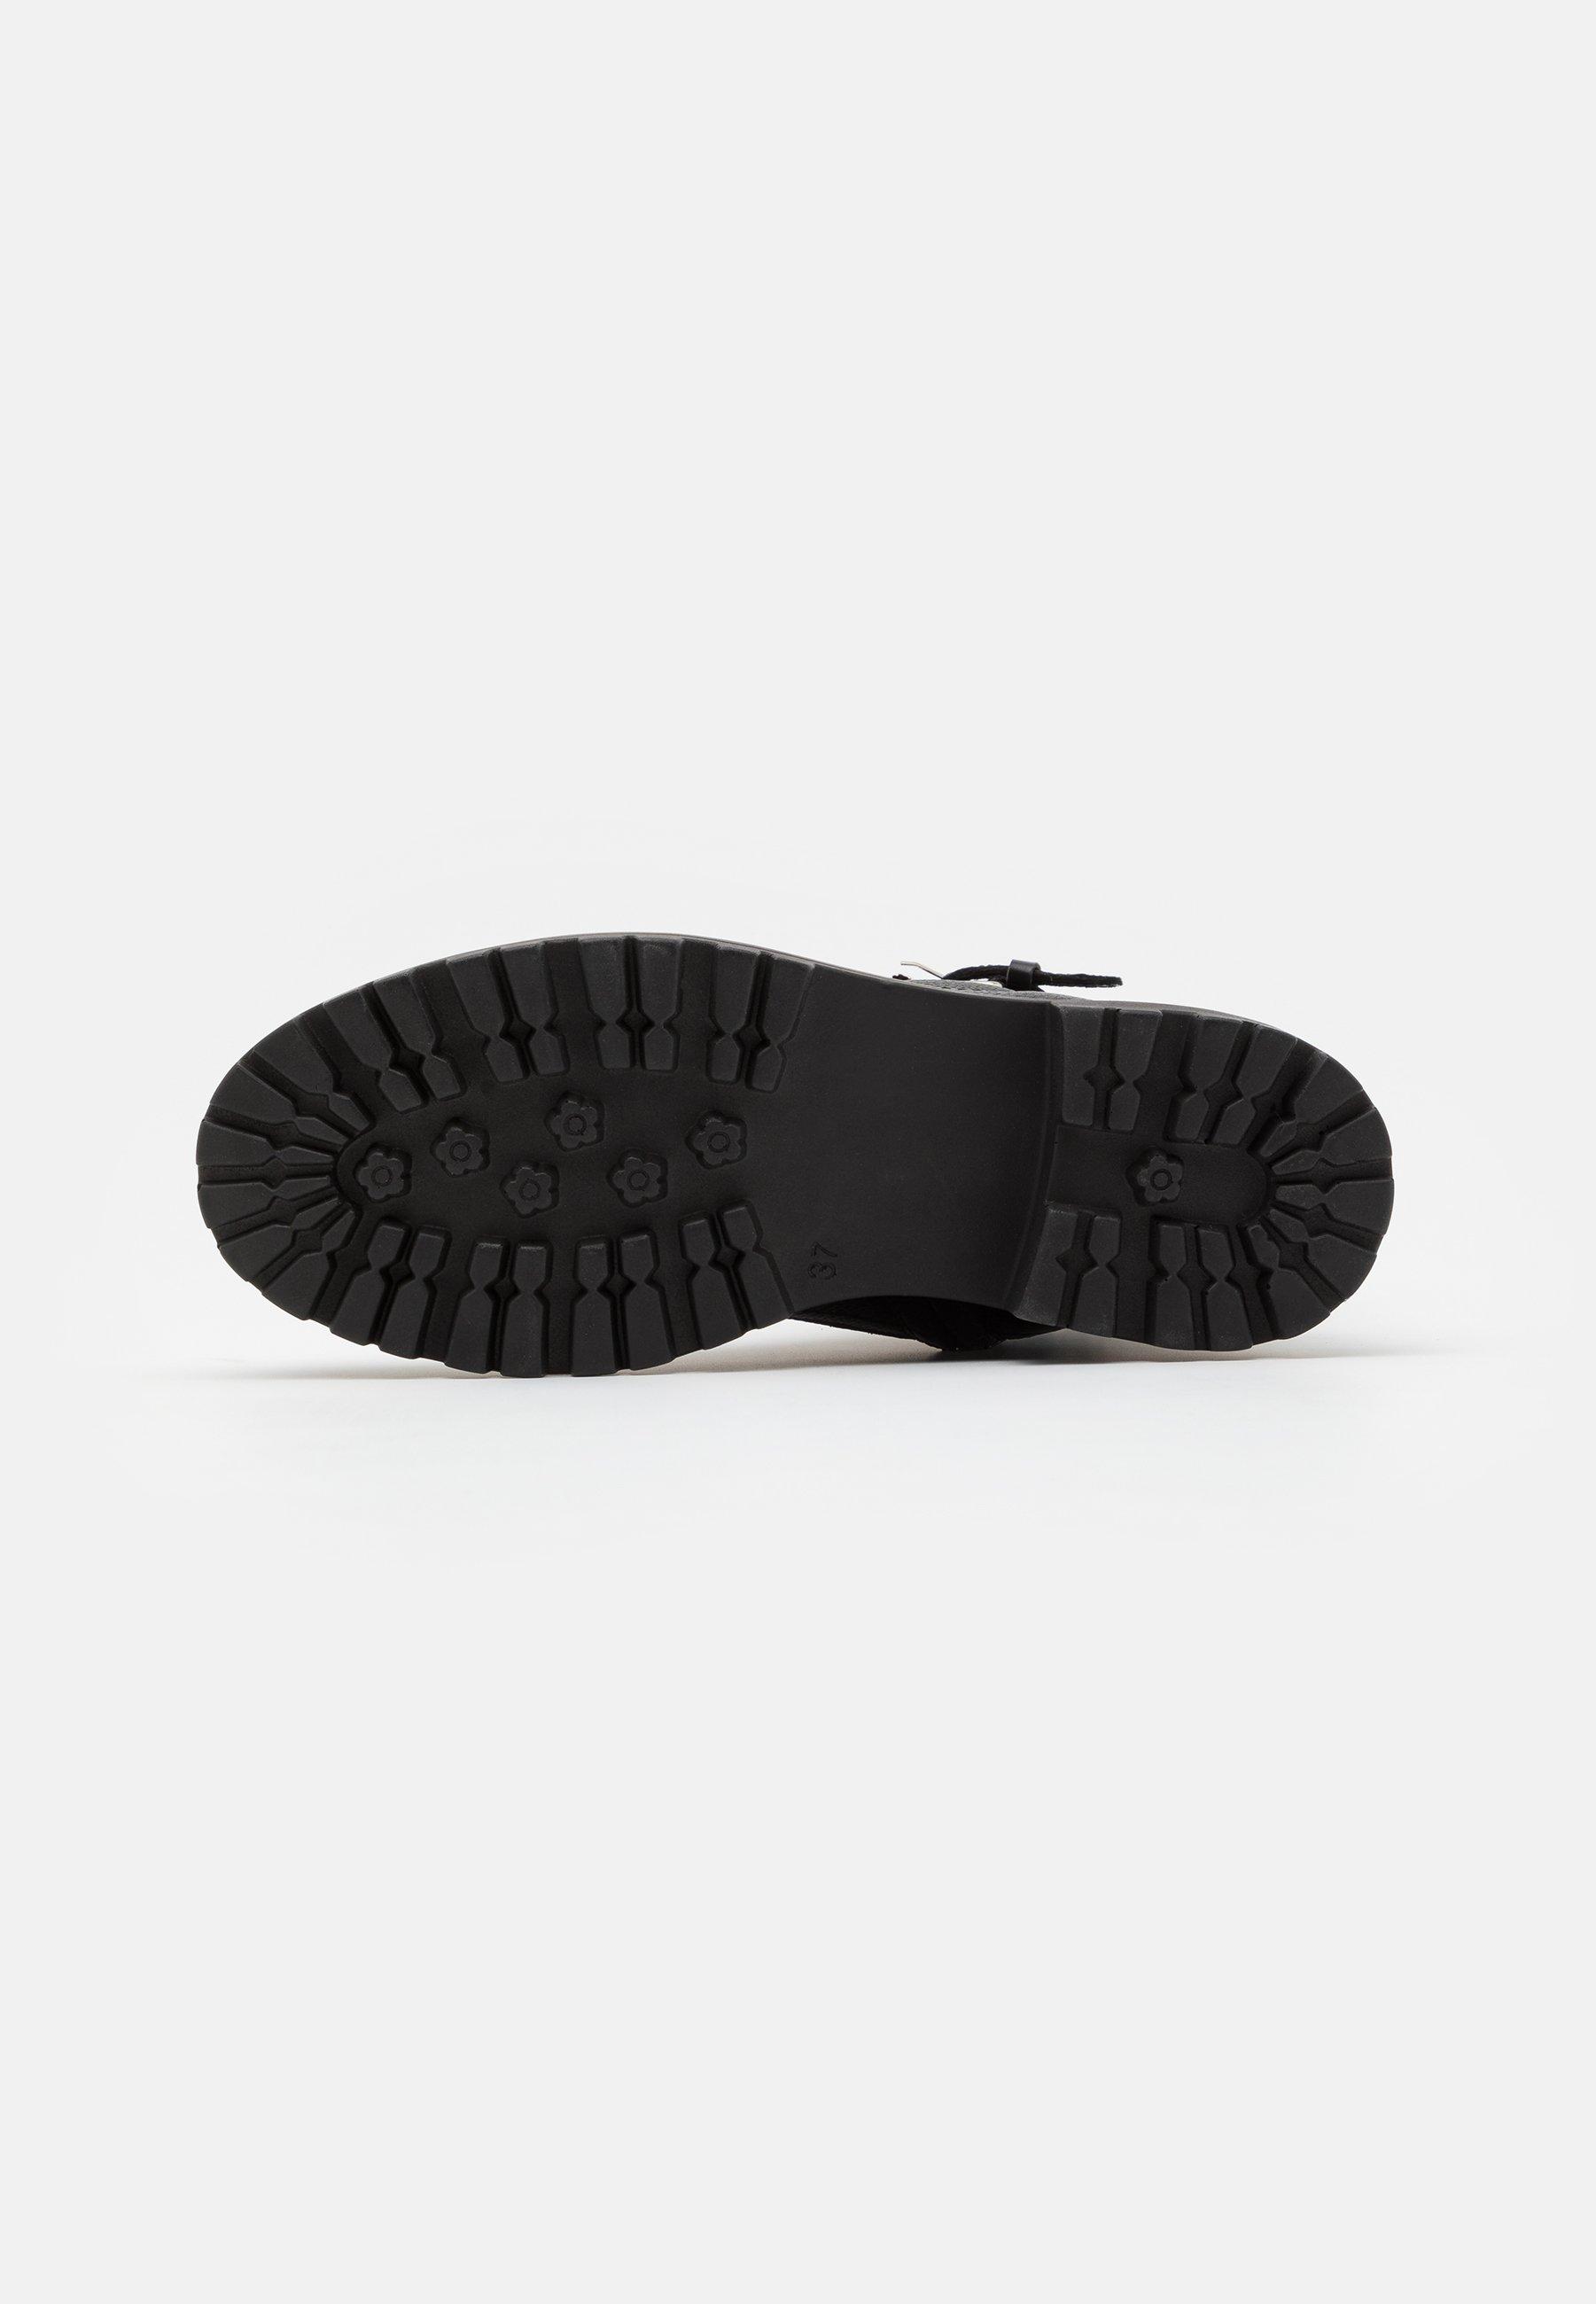 Gioseppo BARNEVELD Plateaustiefelette black/schwarz